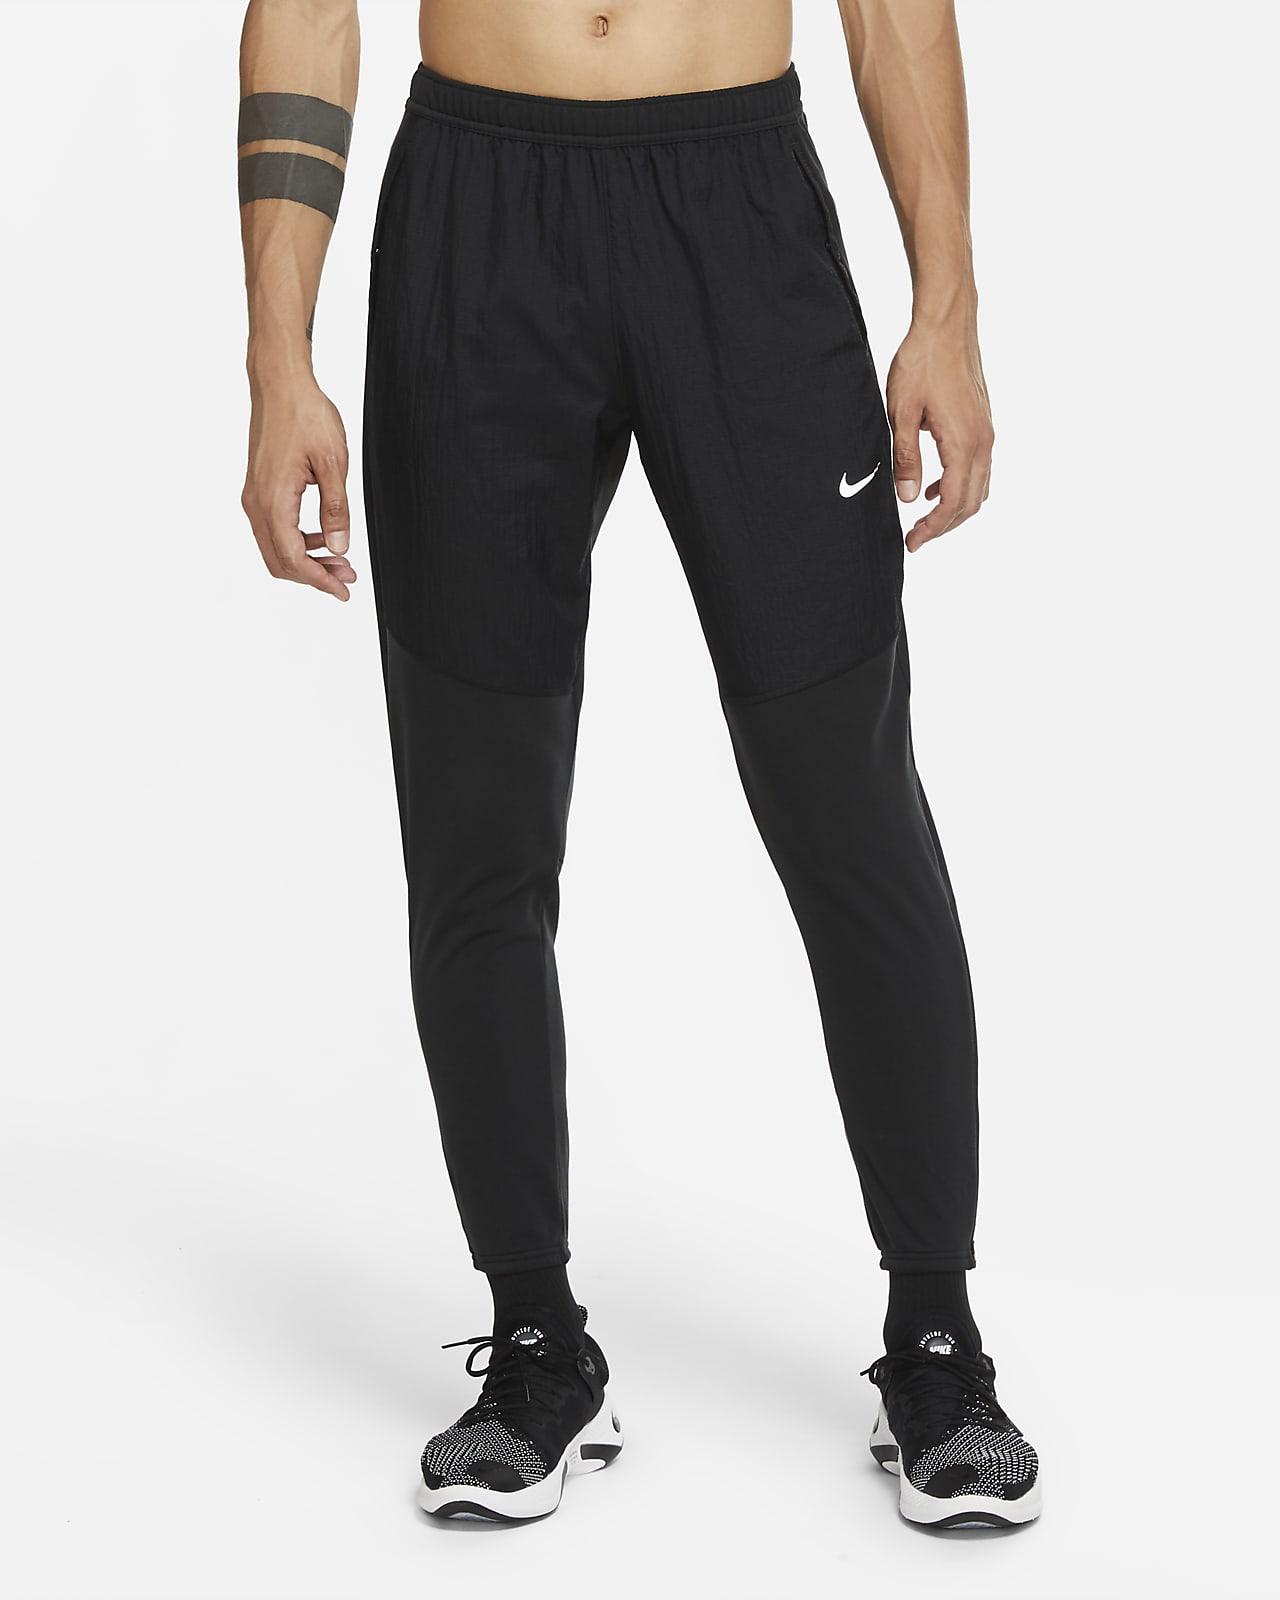 Pantaloni da running Nike Therma Essential - Uomo